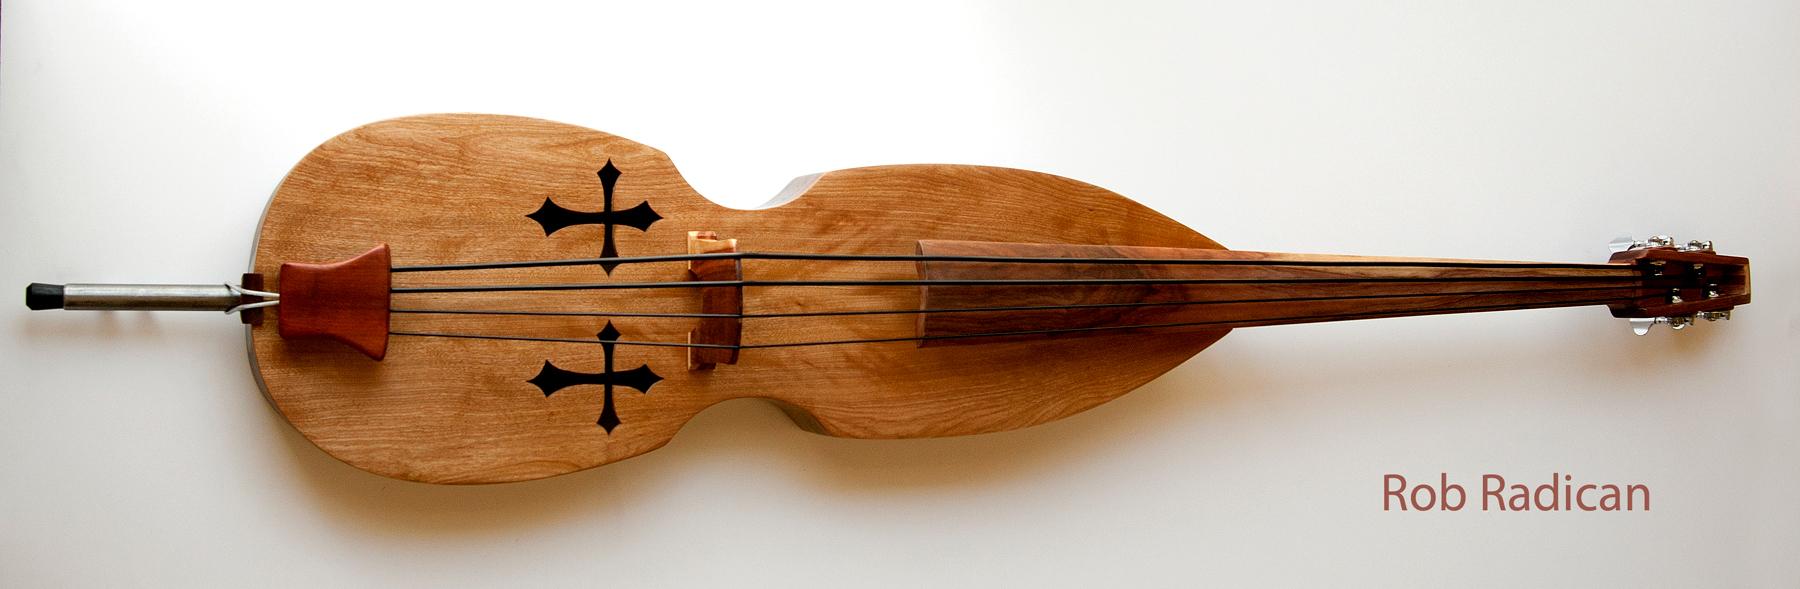 Rob Radican Bass- Musicman Photography